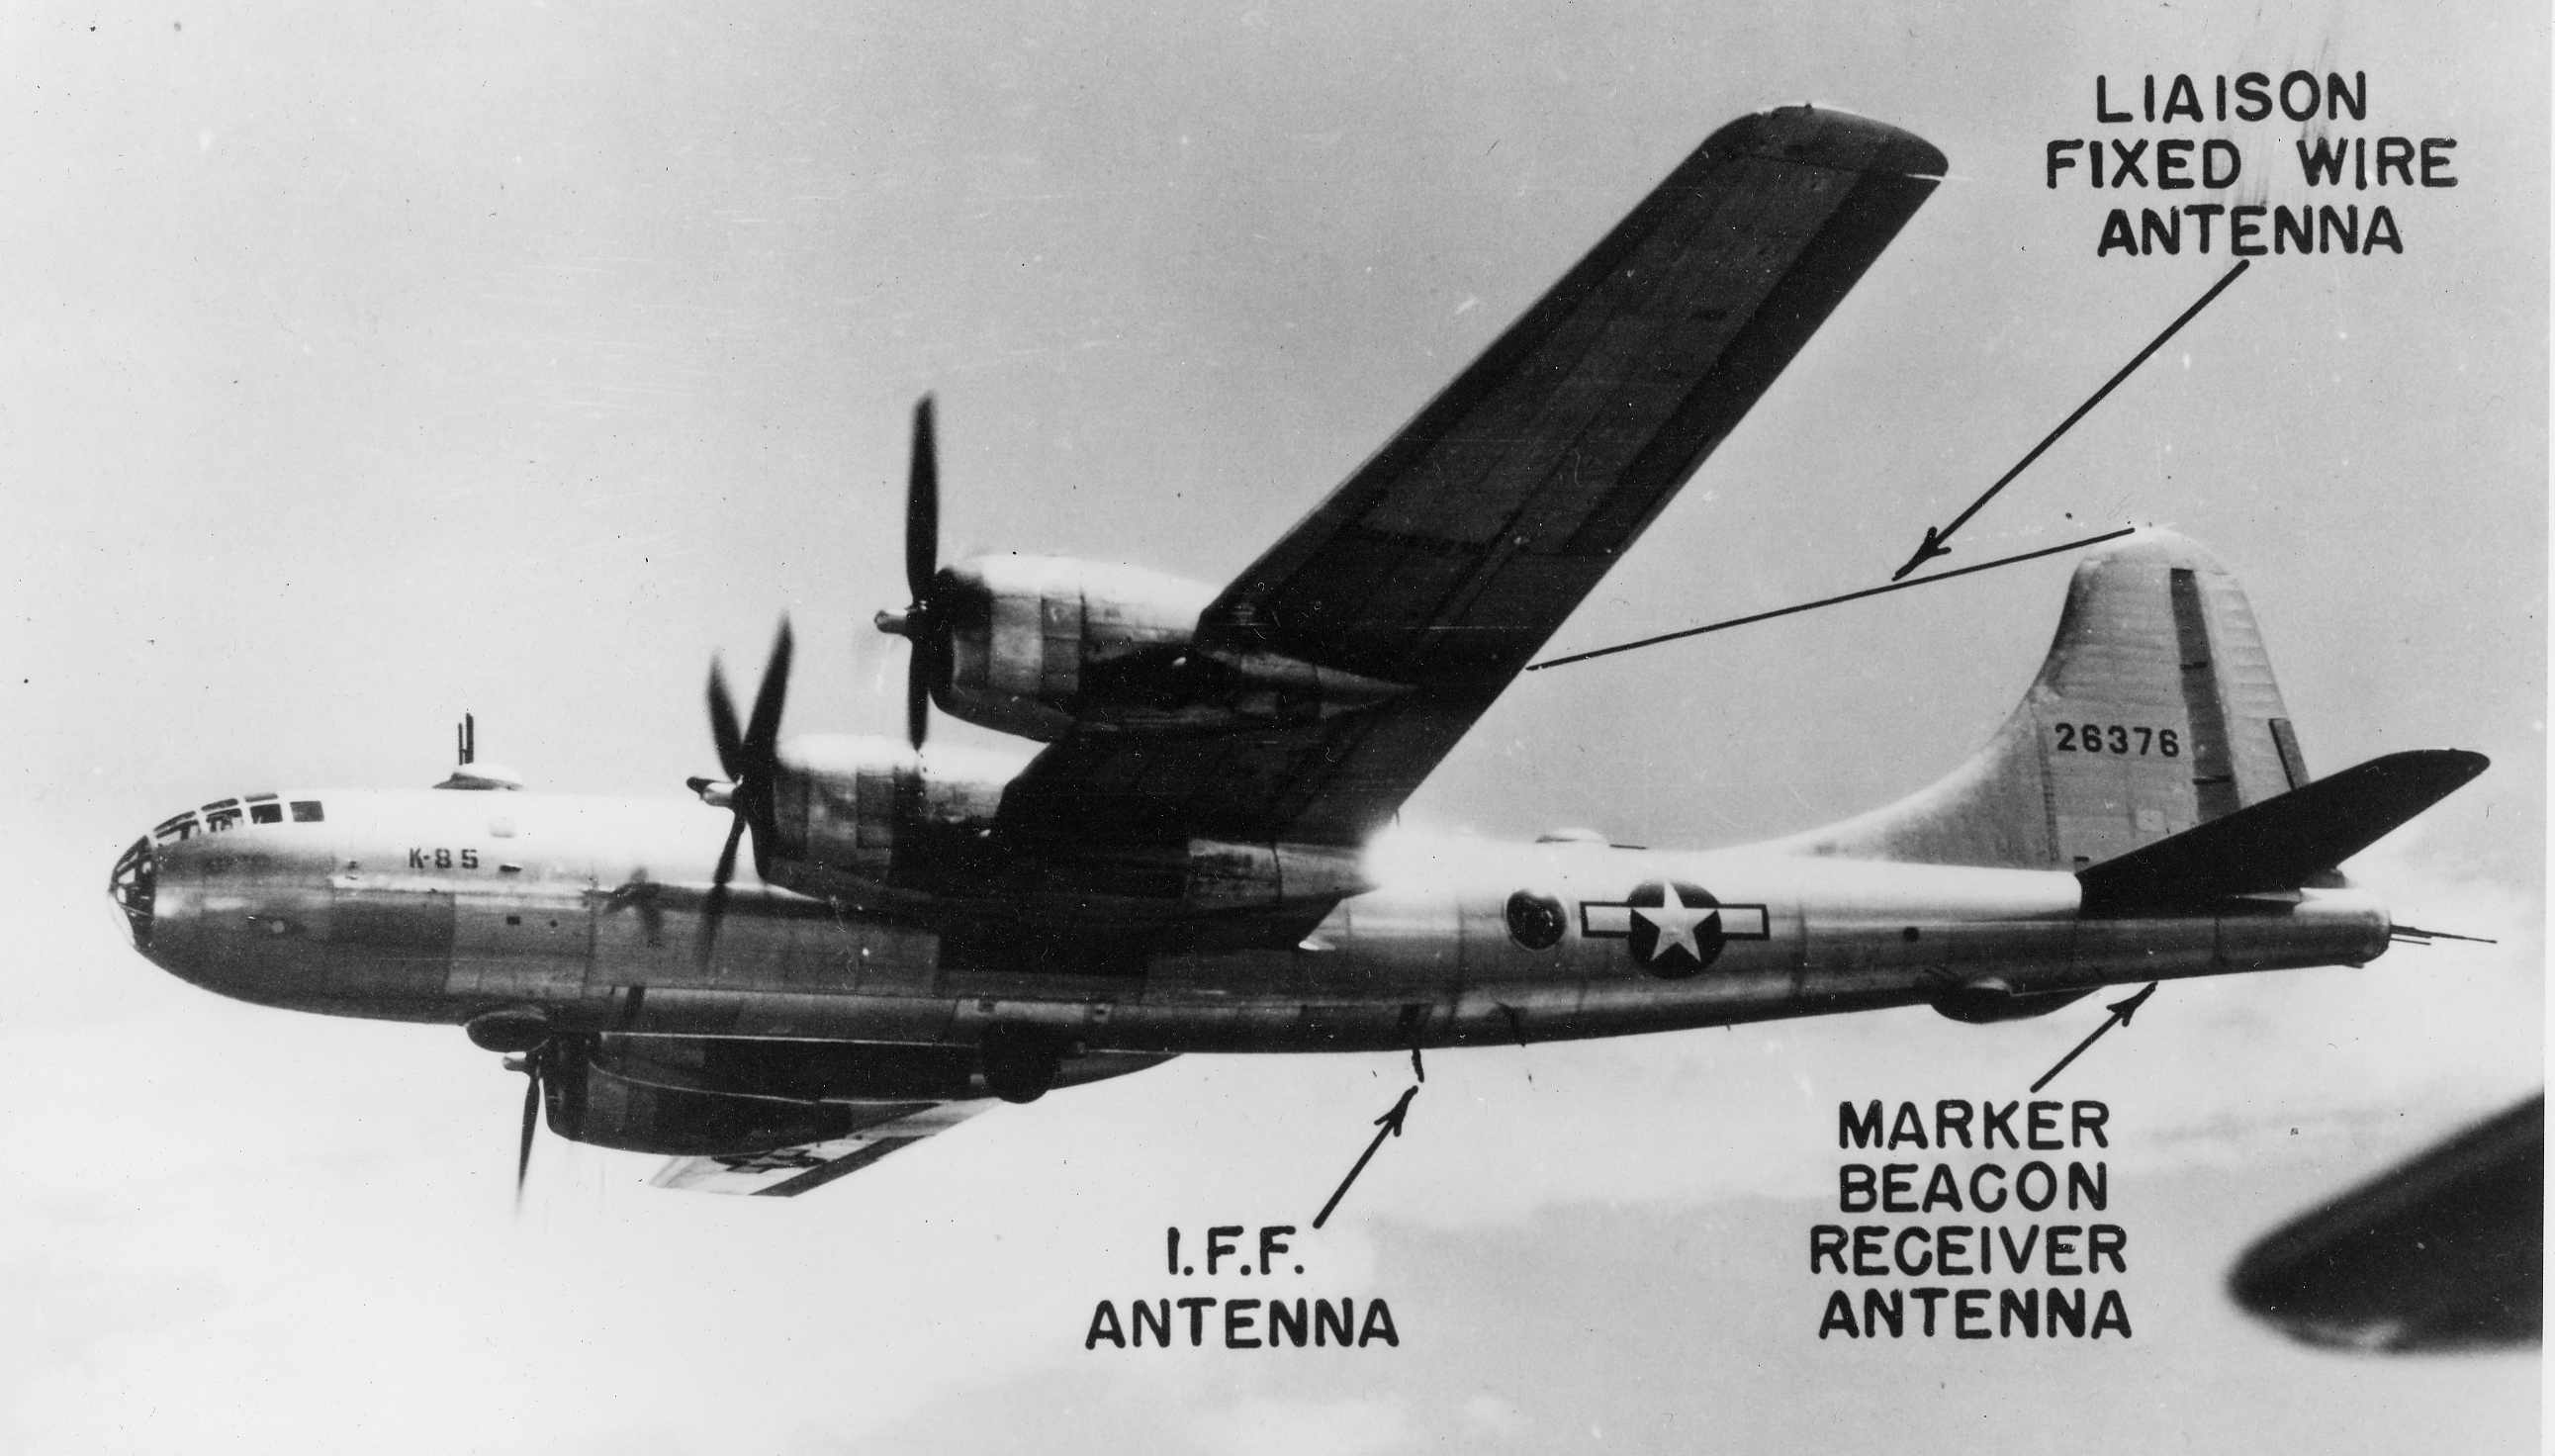 Port side antenna descriptions